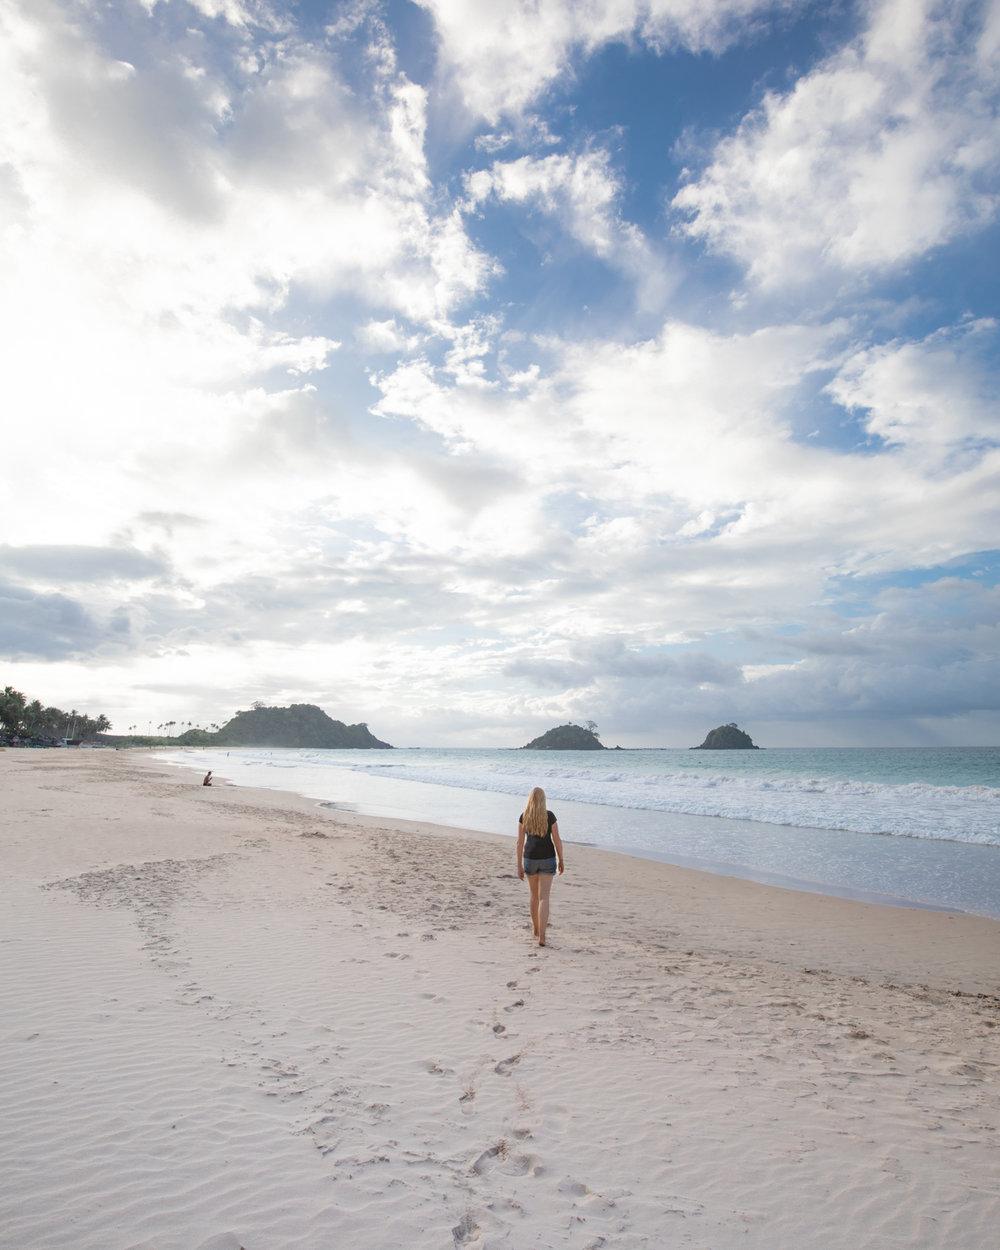 Nacpan Beach - El Nido, Palawan